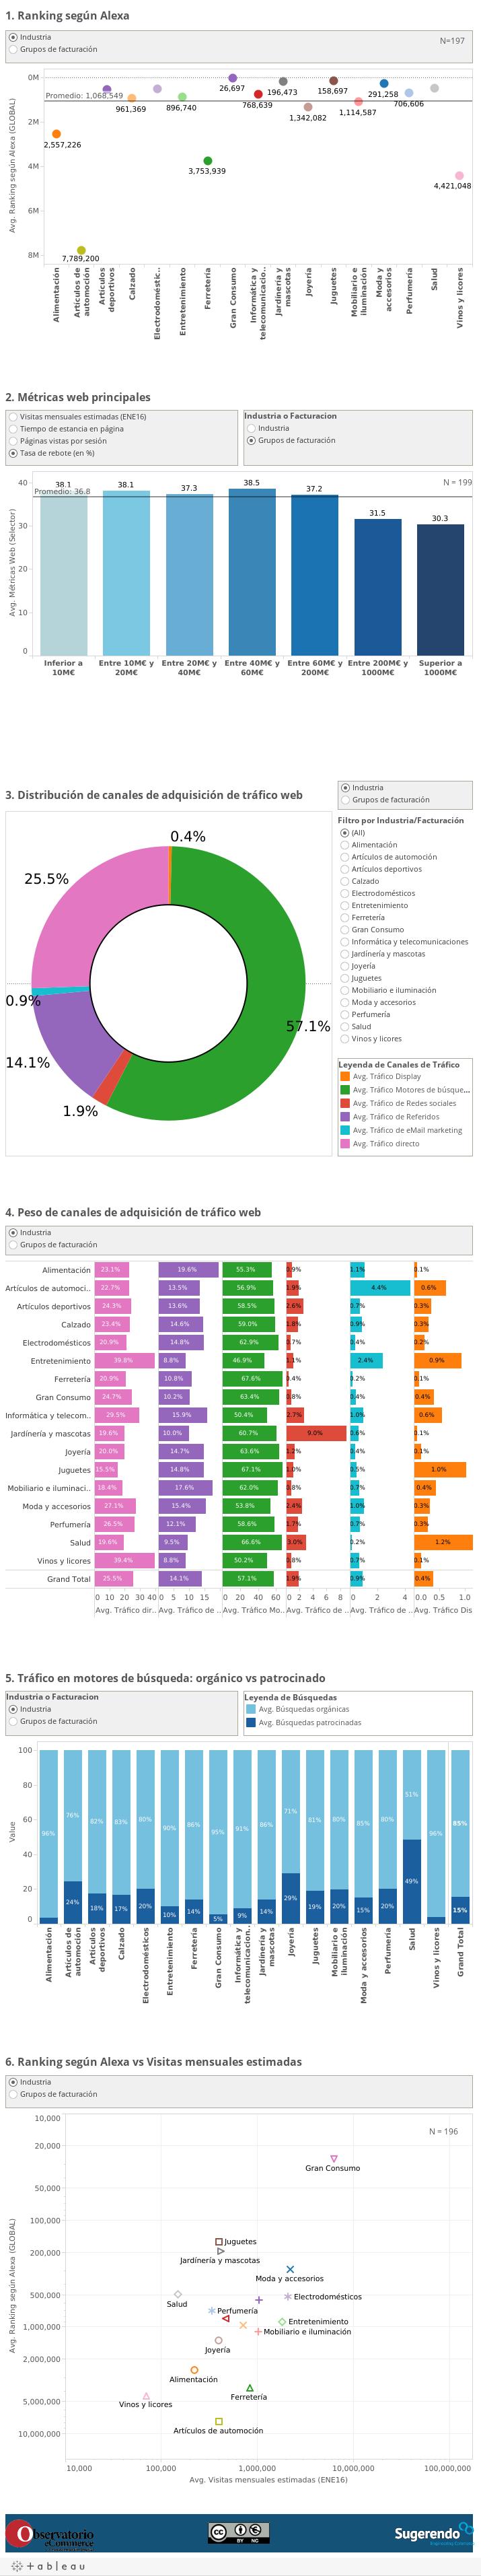 Comparativa métricas web eCommerce Benchmark Spain